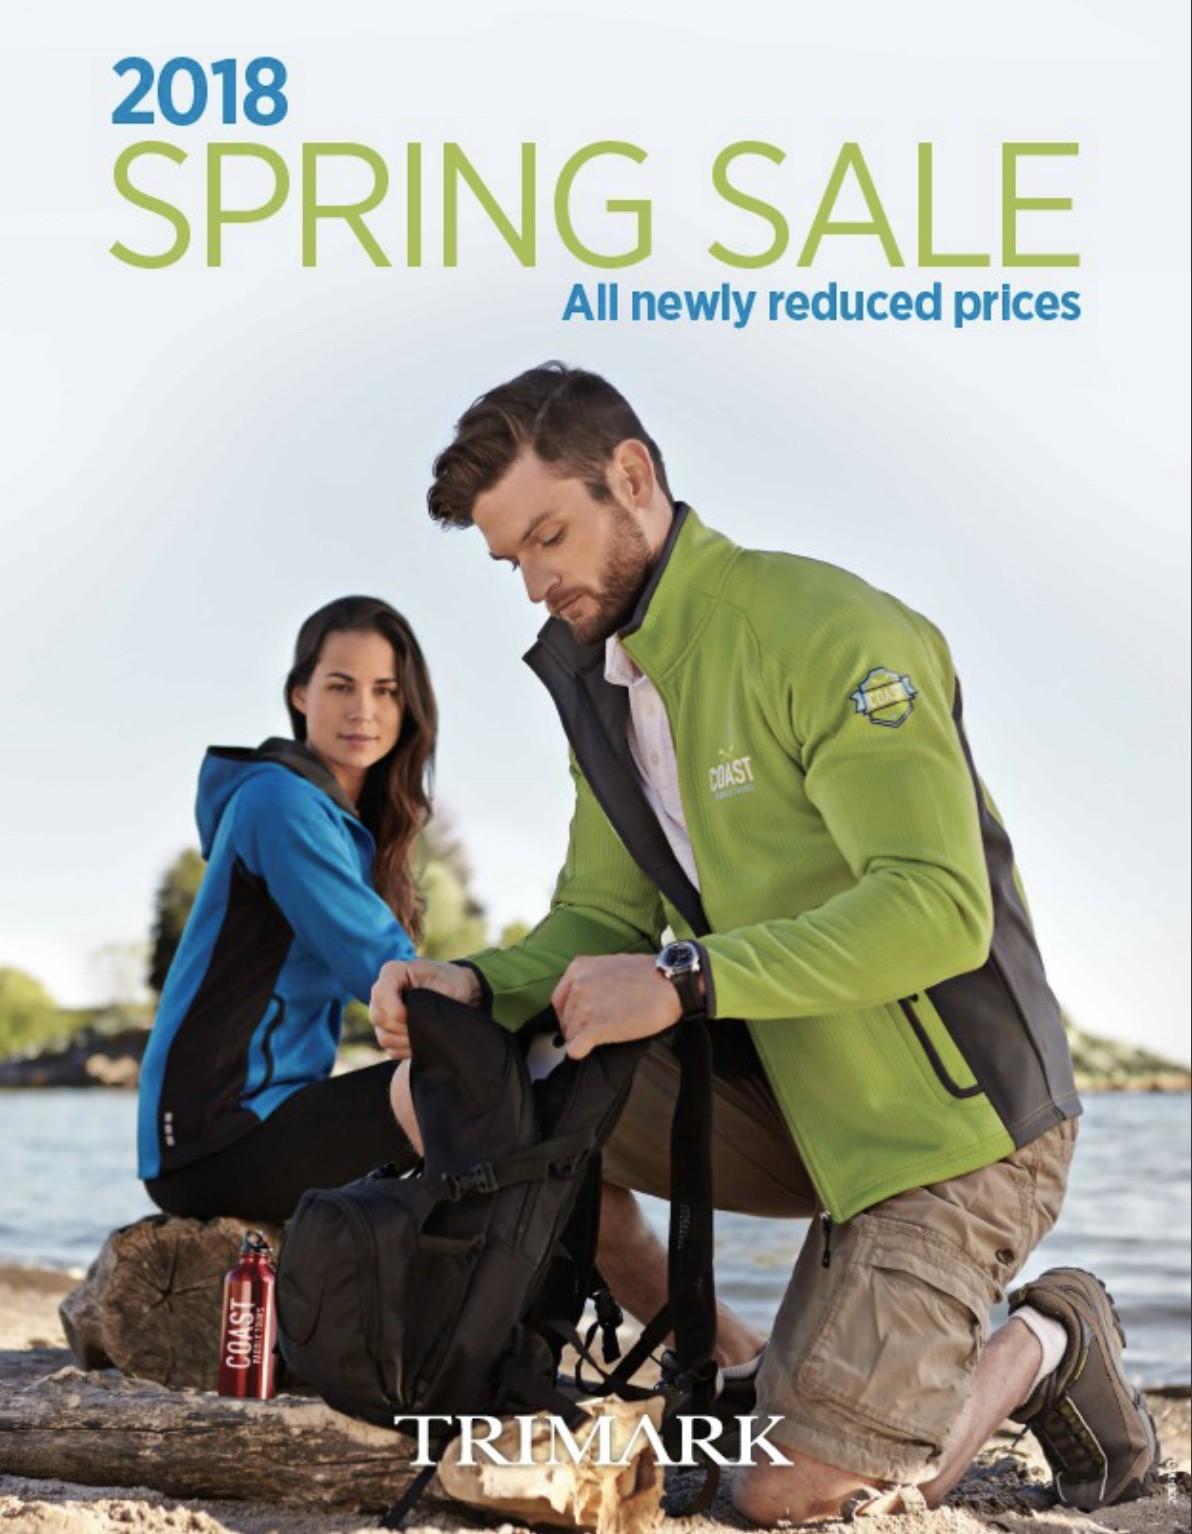 TriMark Spring Sale 2018 USA